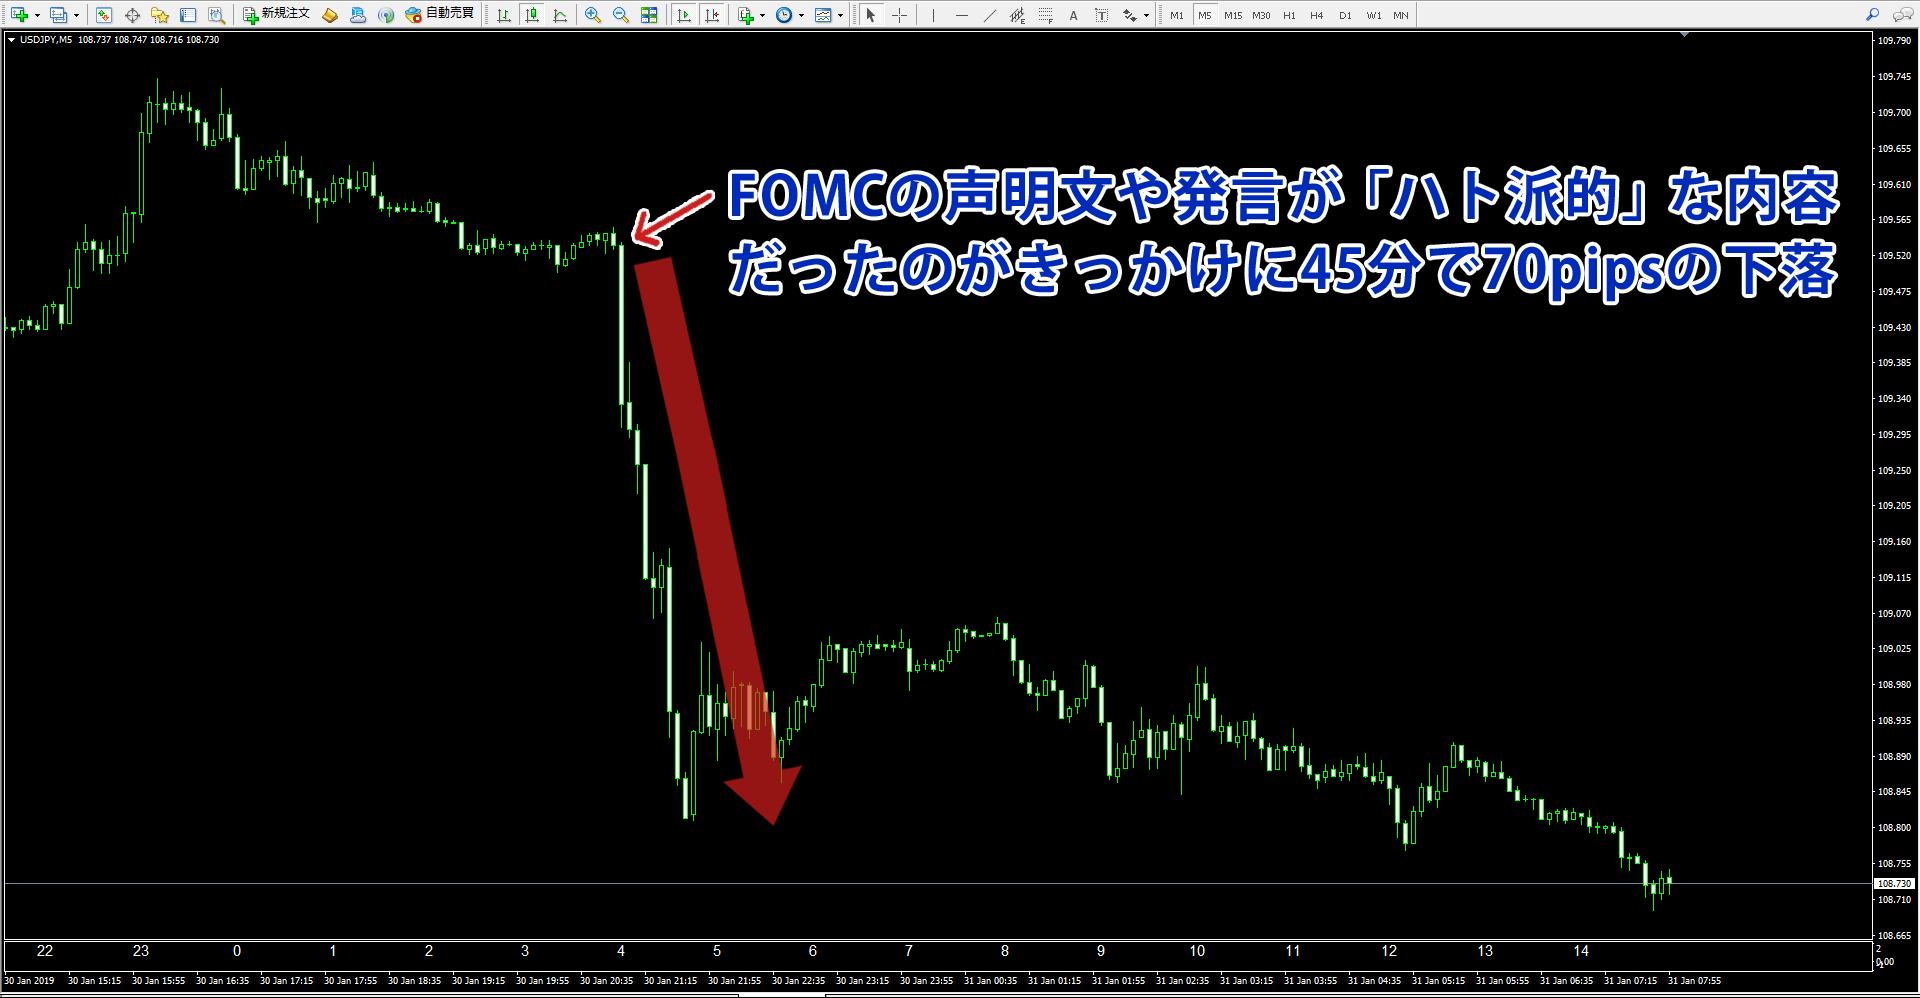 FOMCのハト派的な内容で急落したドル円チャート